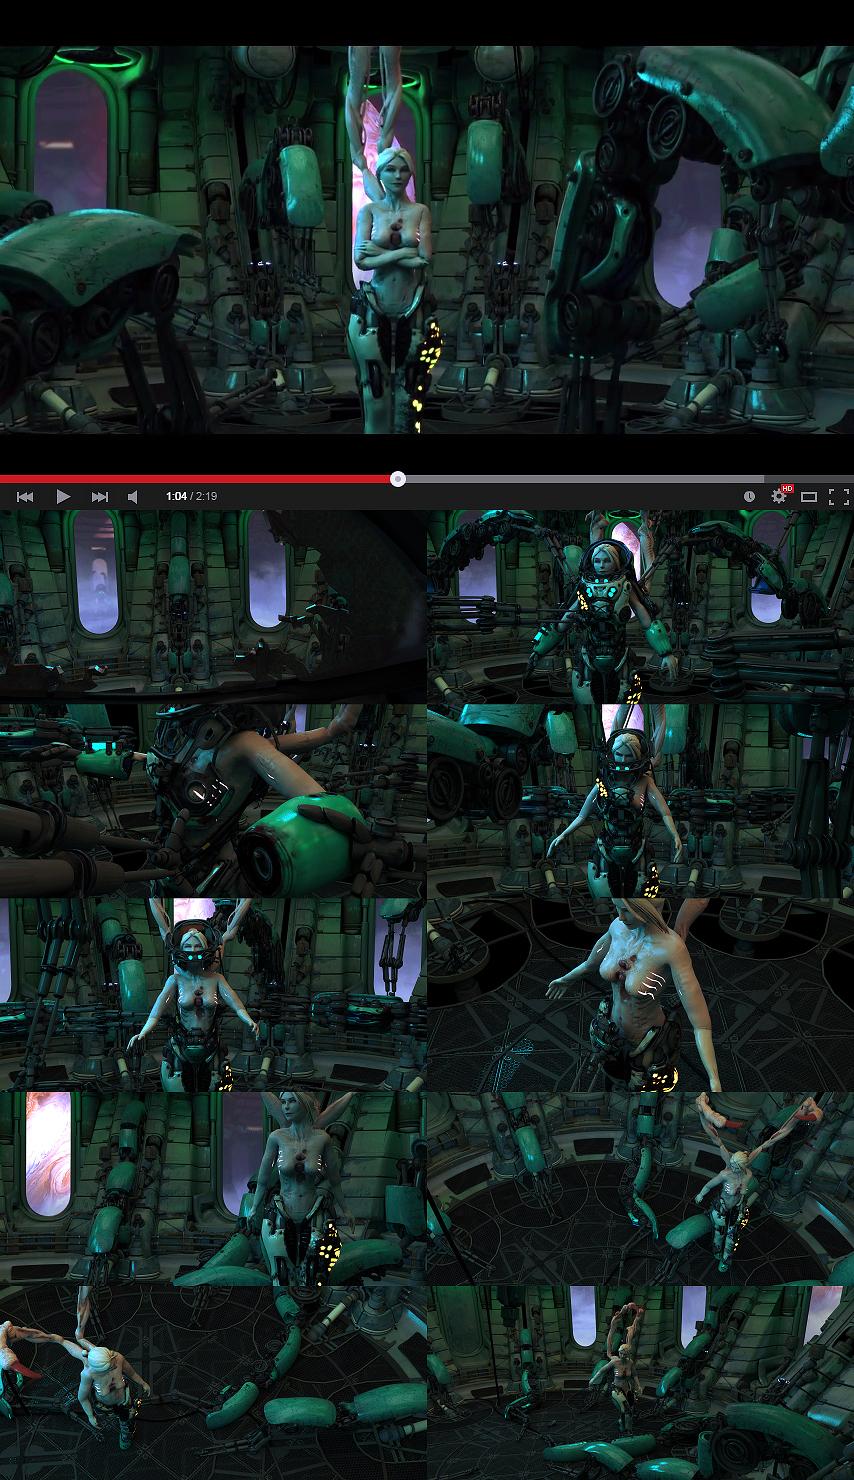 Arsdraw infested medic anima 1 6fc9fa98 9dpy